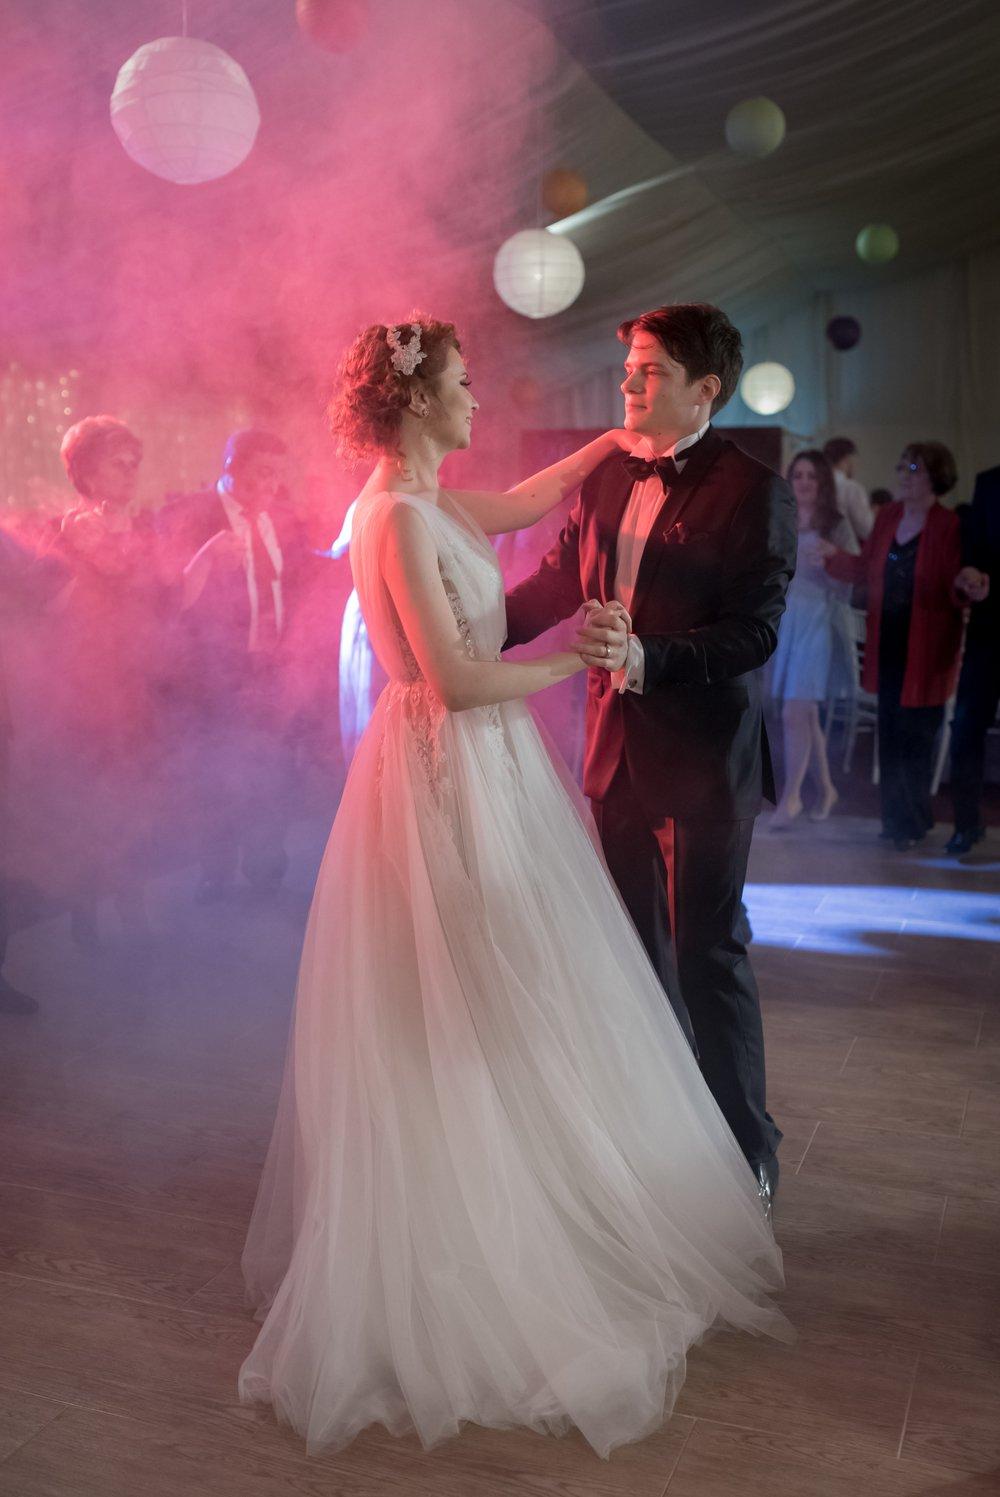 I Do Weddings - nuntiinaerliber.ro - Iulia si Mihai